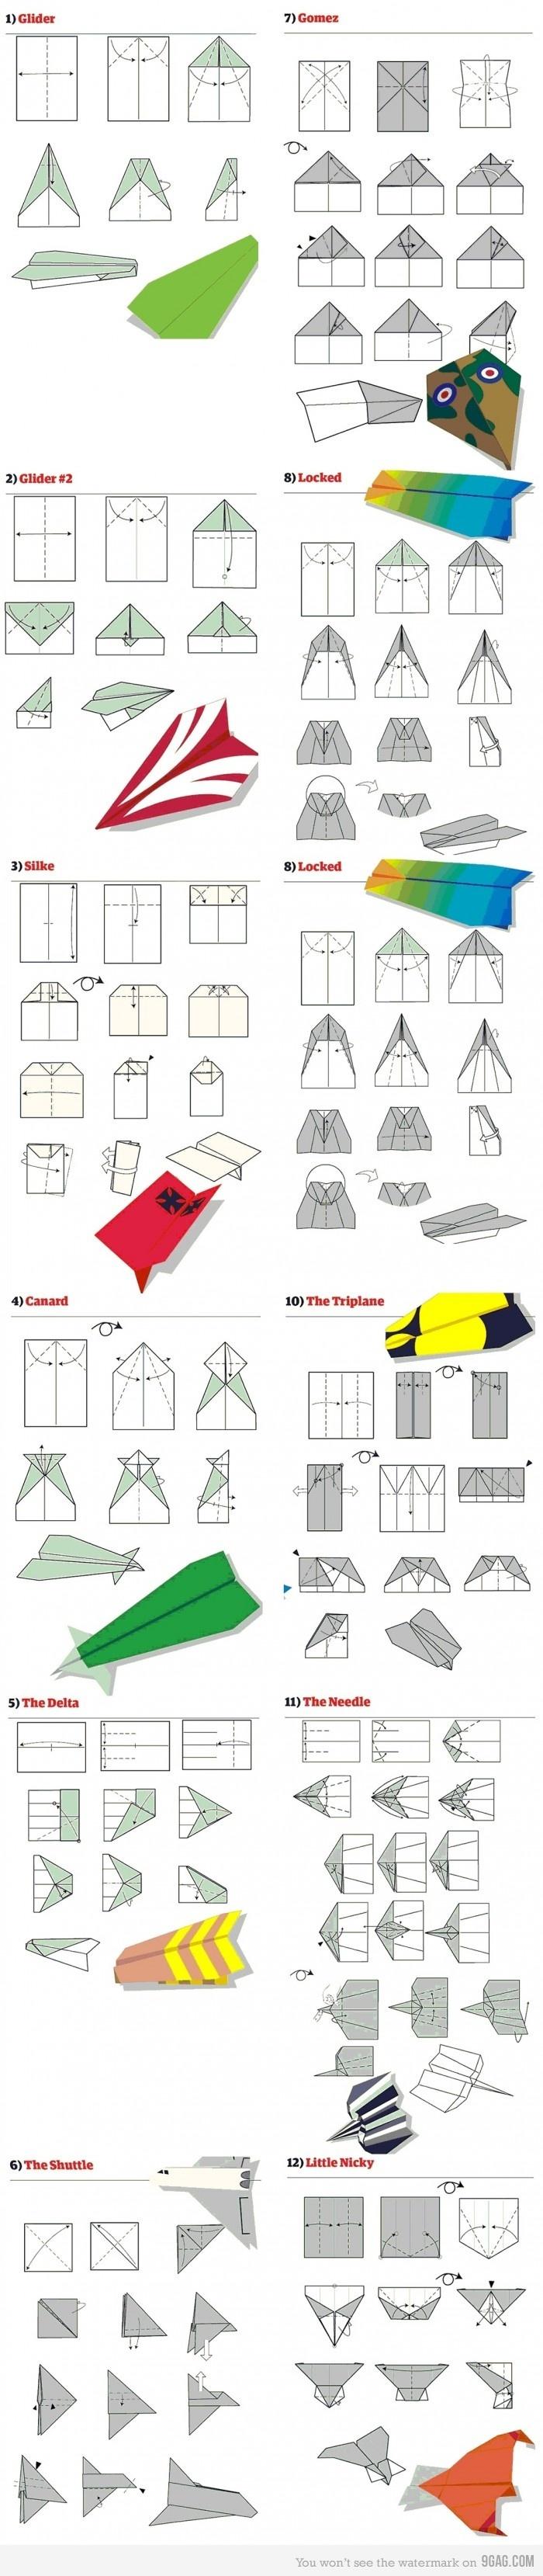 13 Best Origami Images On Pinterest Star Wars Video Diagram Quotswan Quyetquot Paper Planes